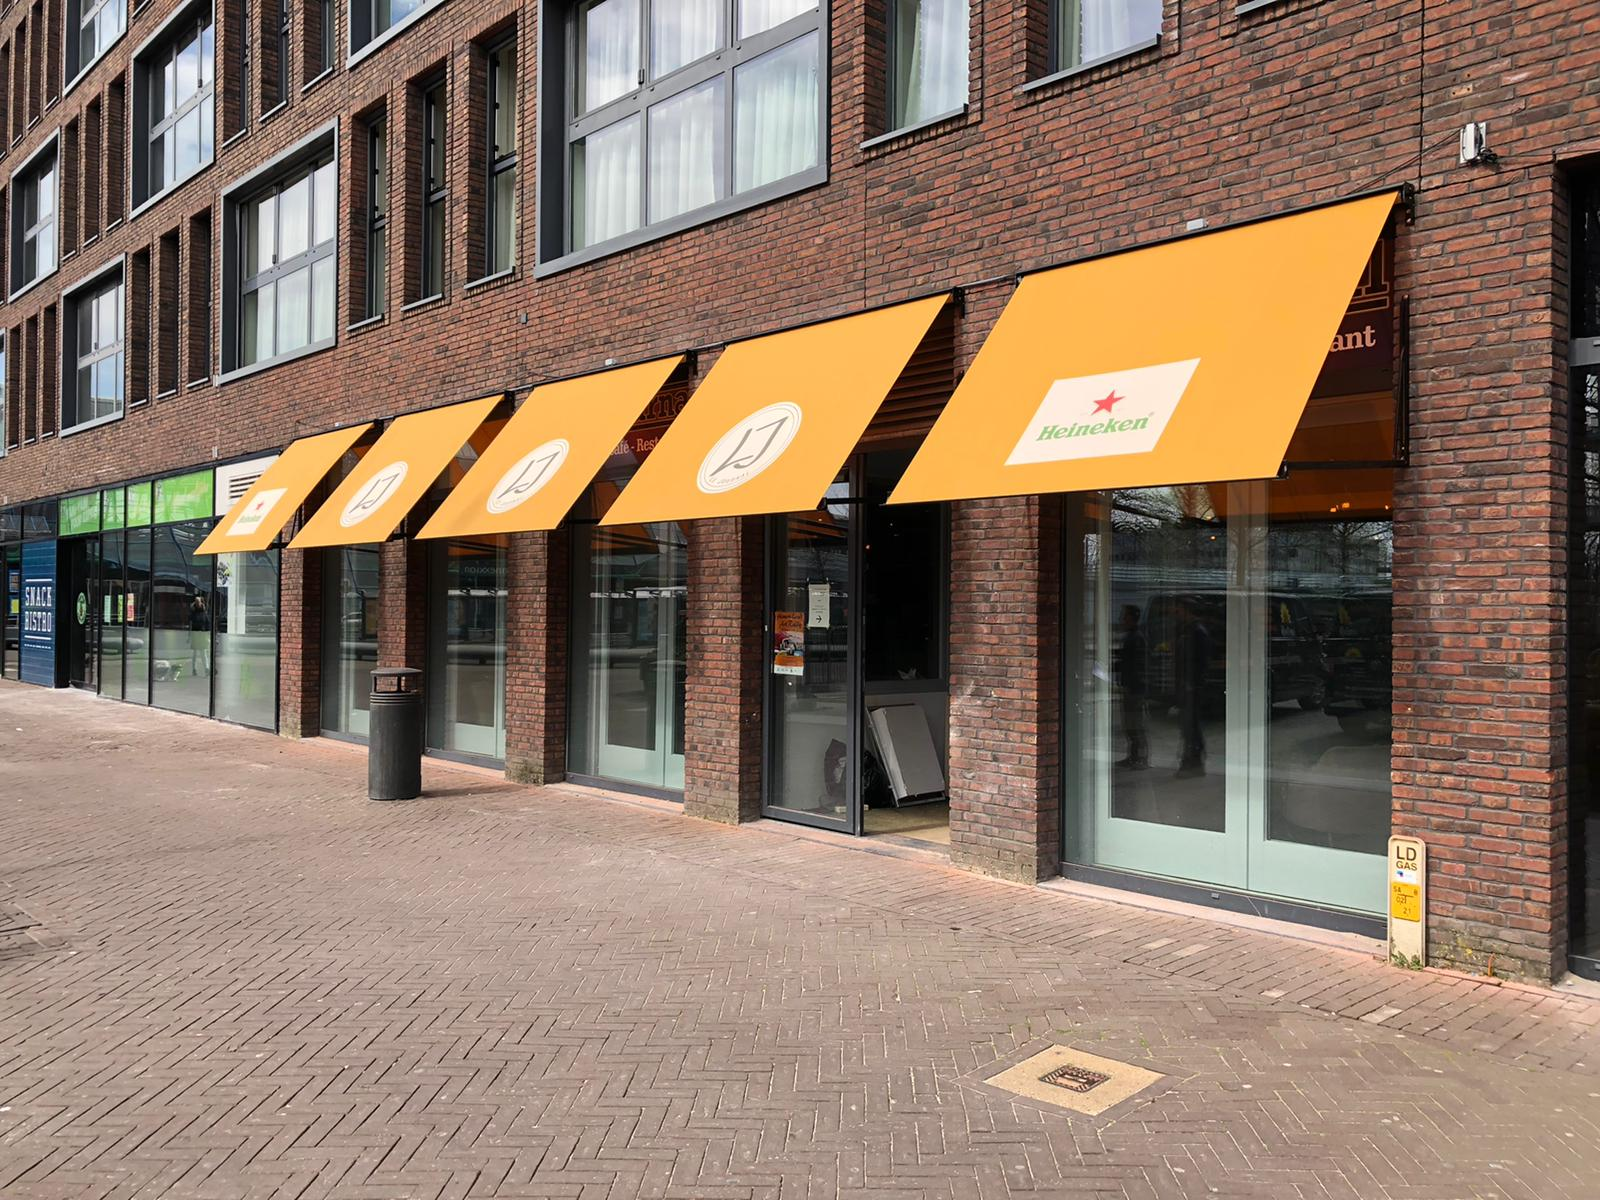 Van Ewijk Zonwering projectzonwering en Le Journal Lelystad